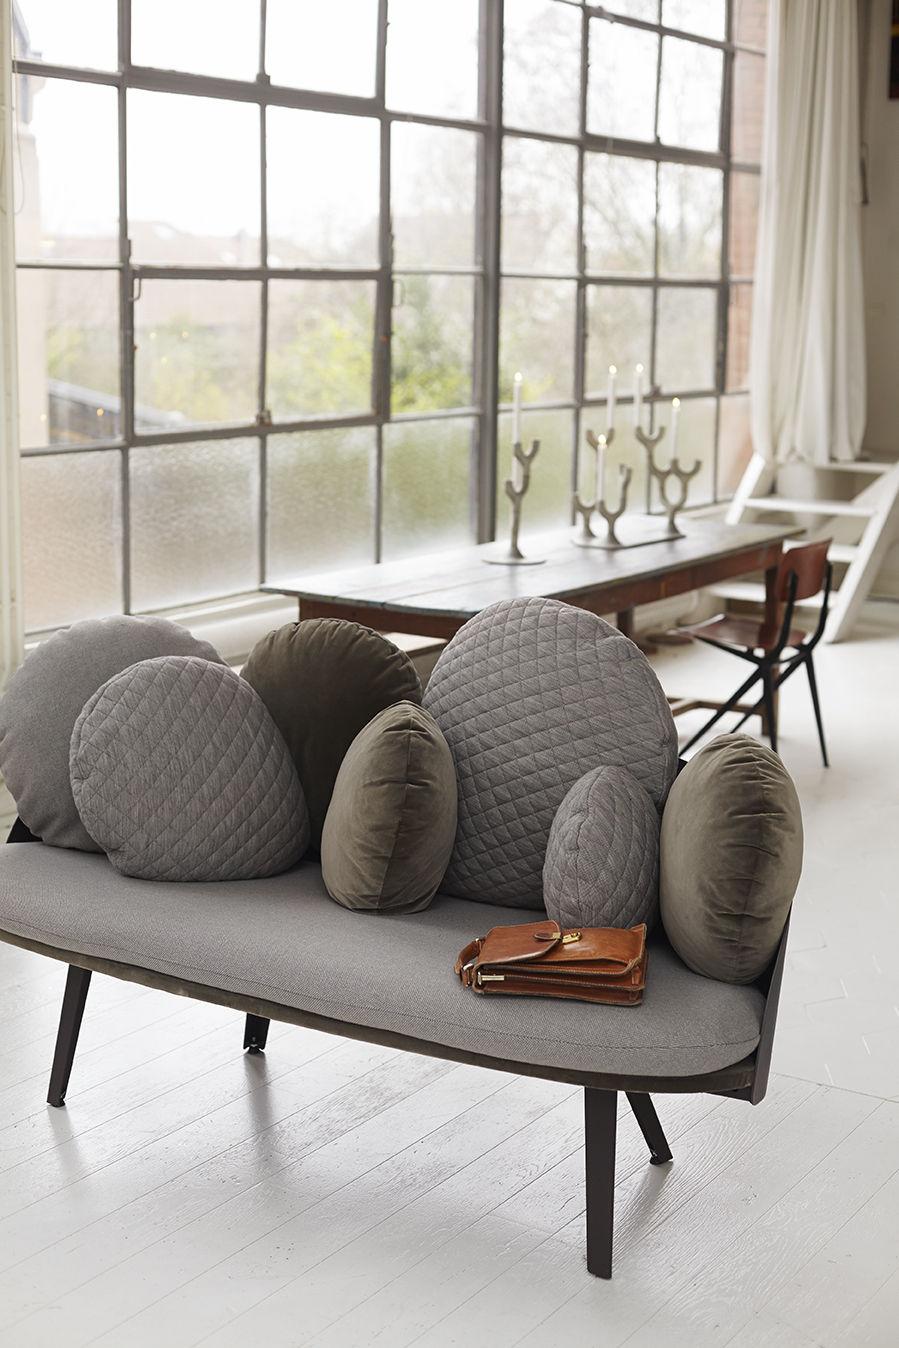 nubilo 2 sitzer l 155 cm petite friture sofa. Black Bedroom Furniture Sets. Home Design Ideas